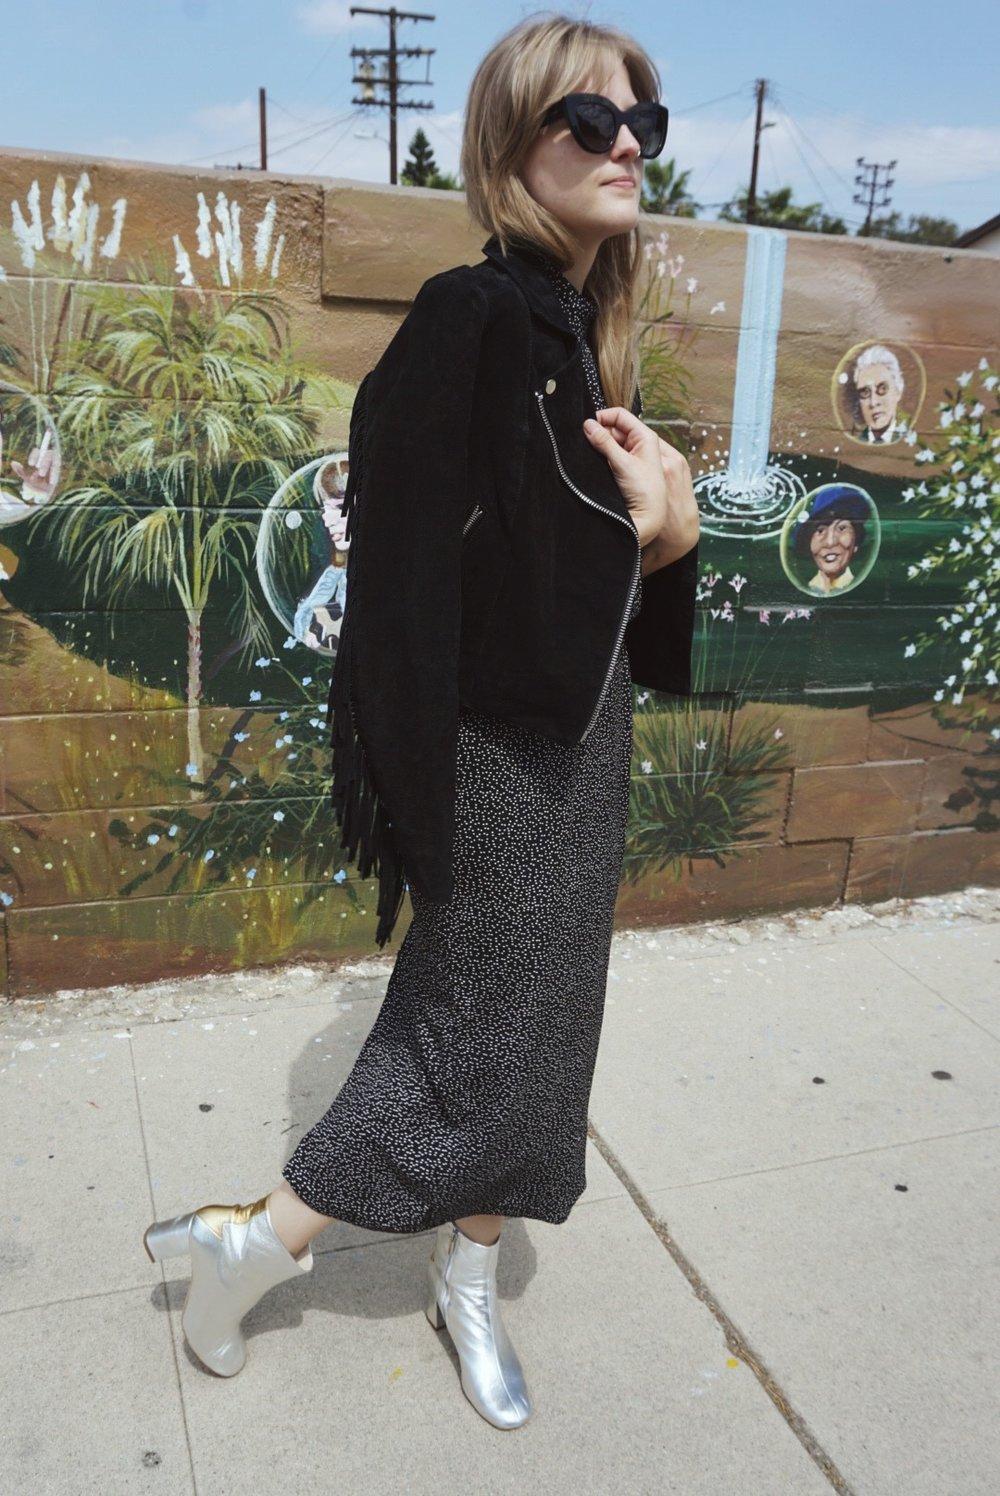 Vintage Dress For The Modern Girl